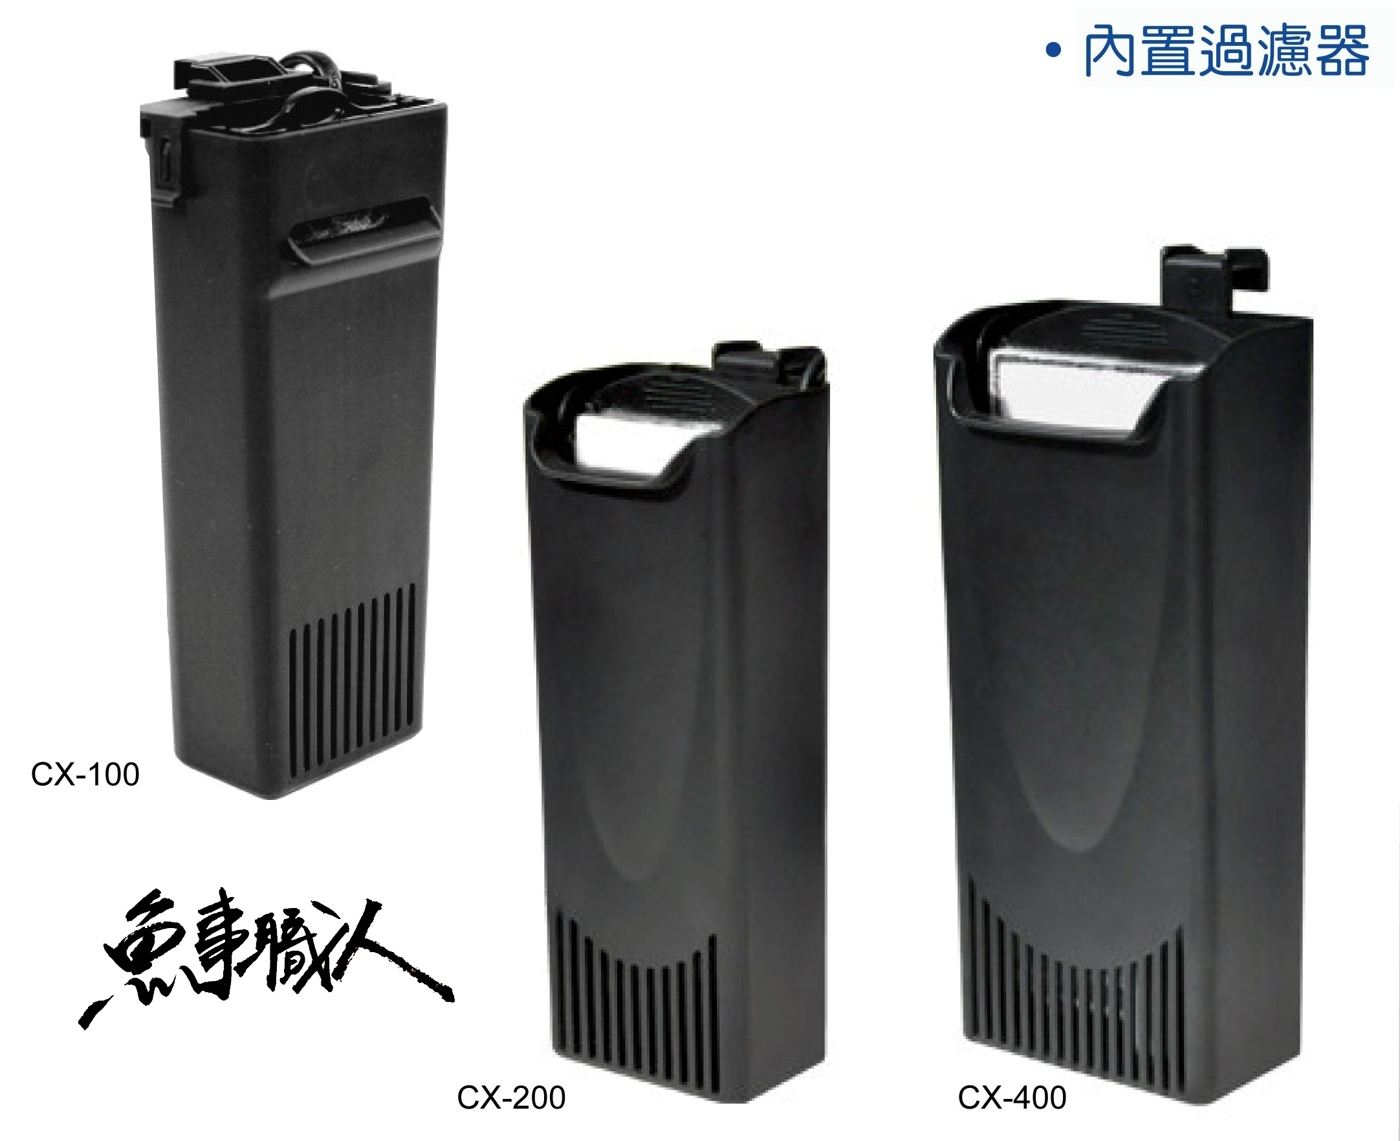 RESUN日生內置過濾器CX-200 200L H烏龜兩棲蓮花盆青蛙戶外過濾不受地形限制魚事職人